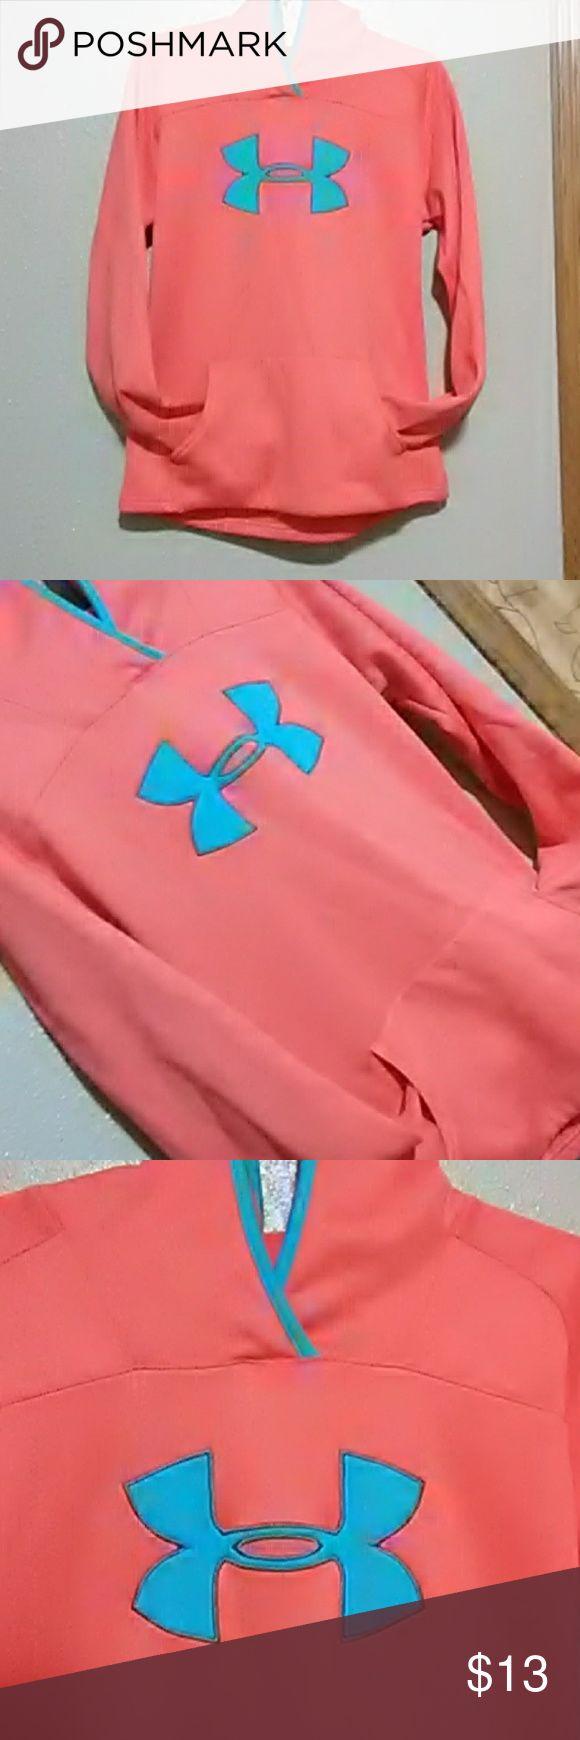 Under armour hoodie Women's medium Under armour Hoodie Orange/coral and blue Trade value $20 Under Armour Tops Sweatshirts & Hoodies